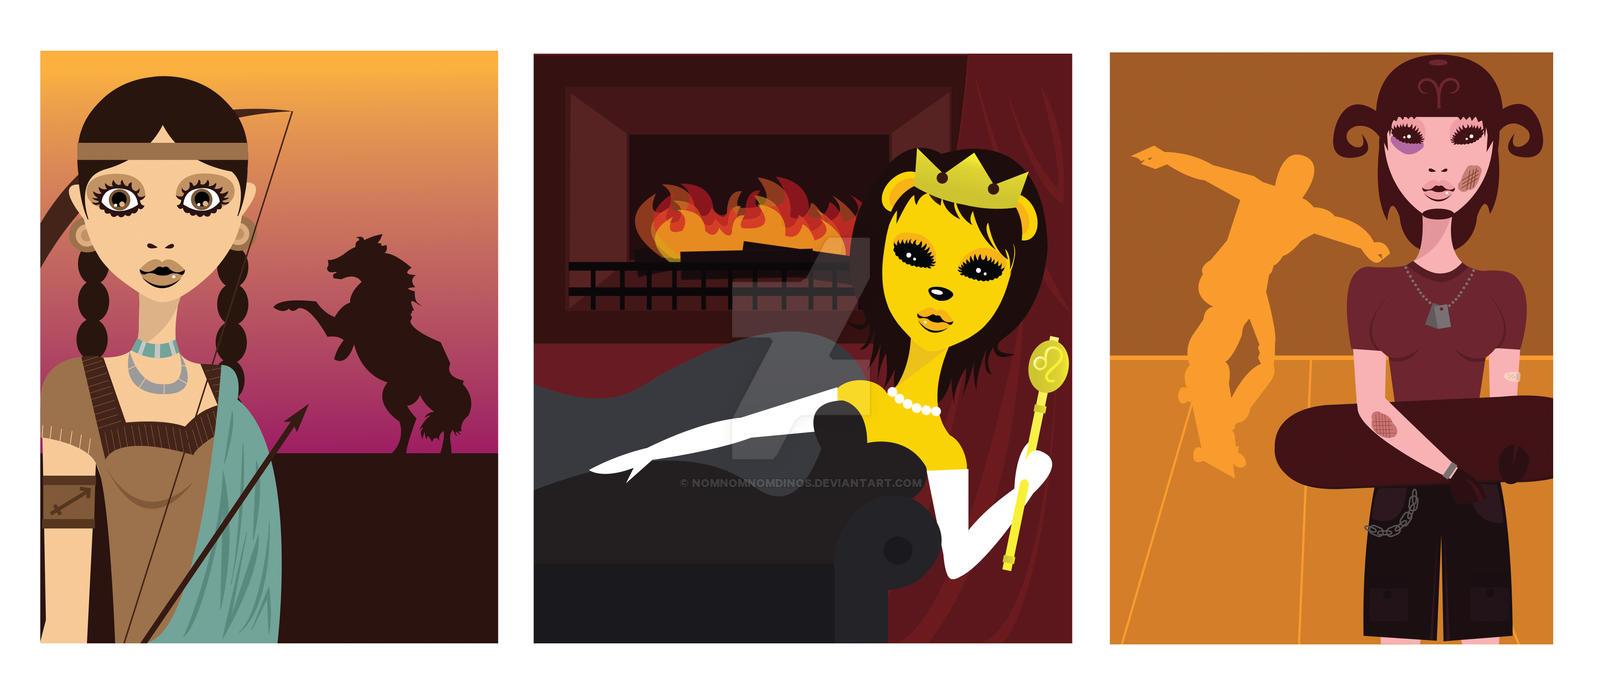 Zodiac: Fire Series by NomNomNomDinos on DeviantArt